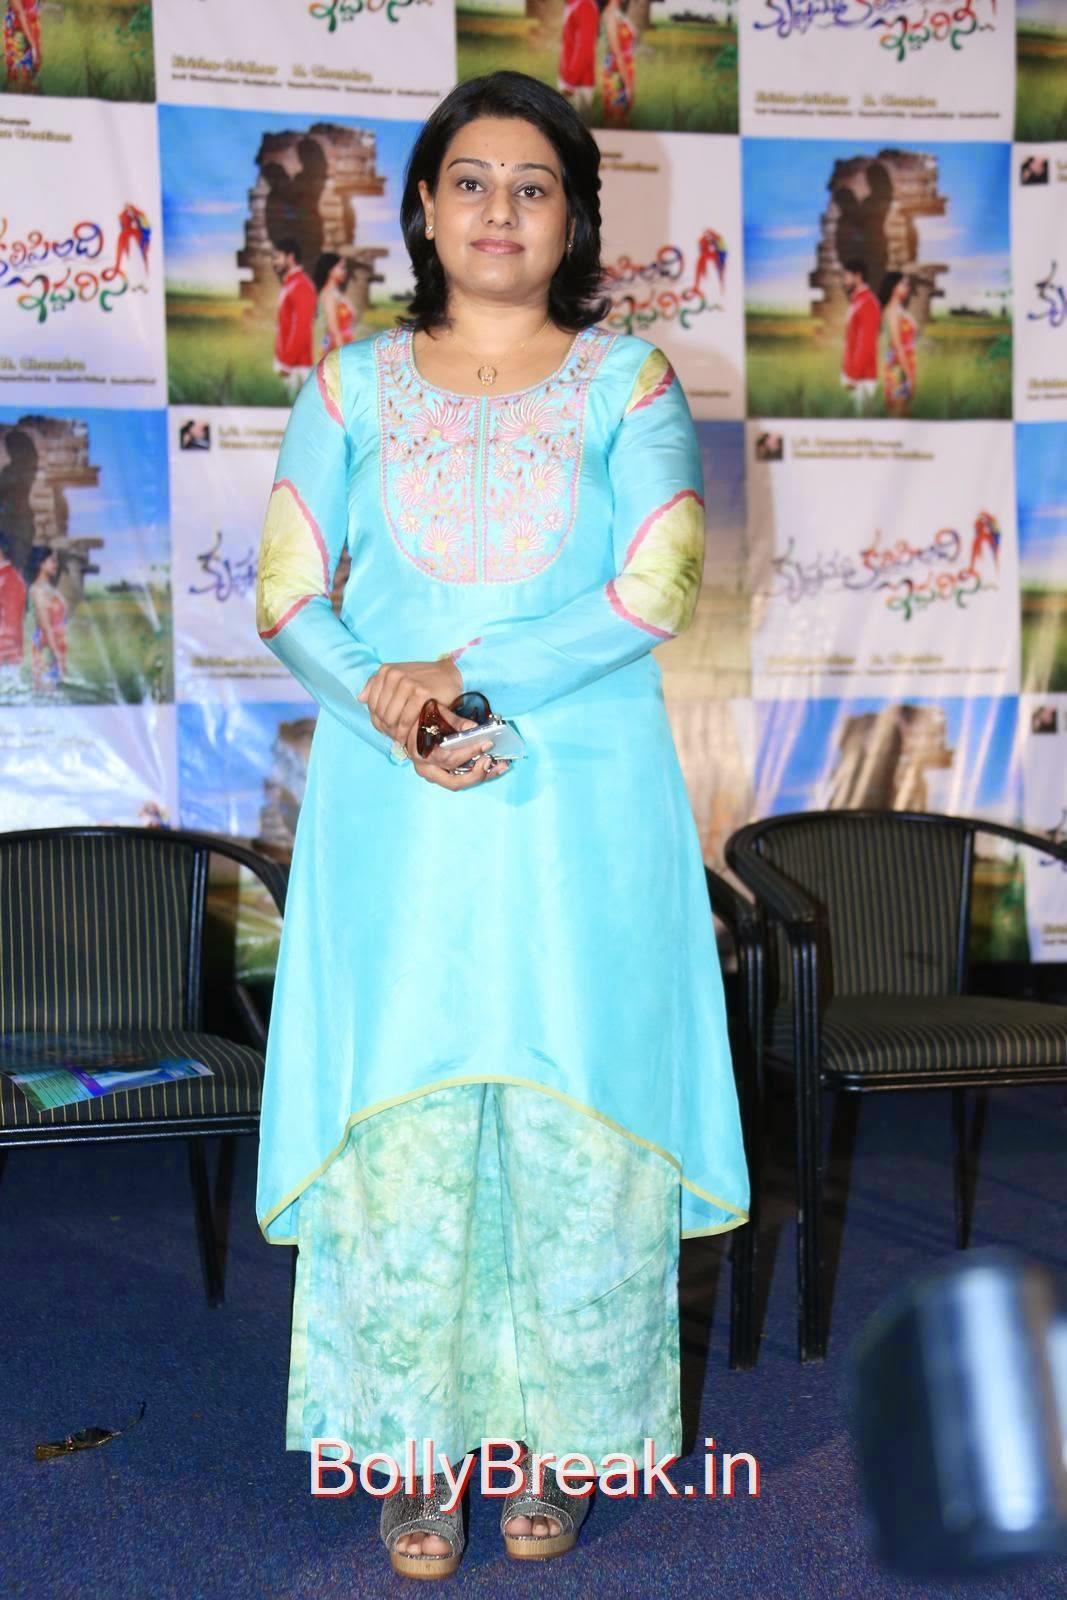 Lagadapati Sirisha Sridhar Photo Gallery, Hot HD Images Of Lagadapati Sirisha Sridhar  In Blue Dress At Krishnamma Kalipindi Iddarini Press Meet